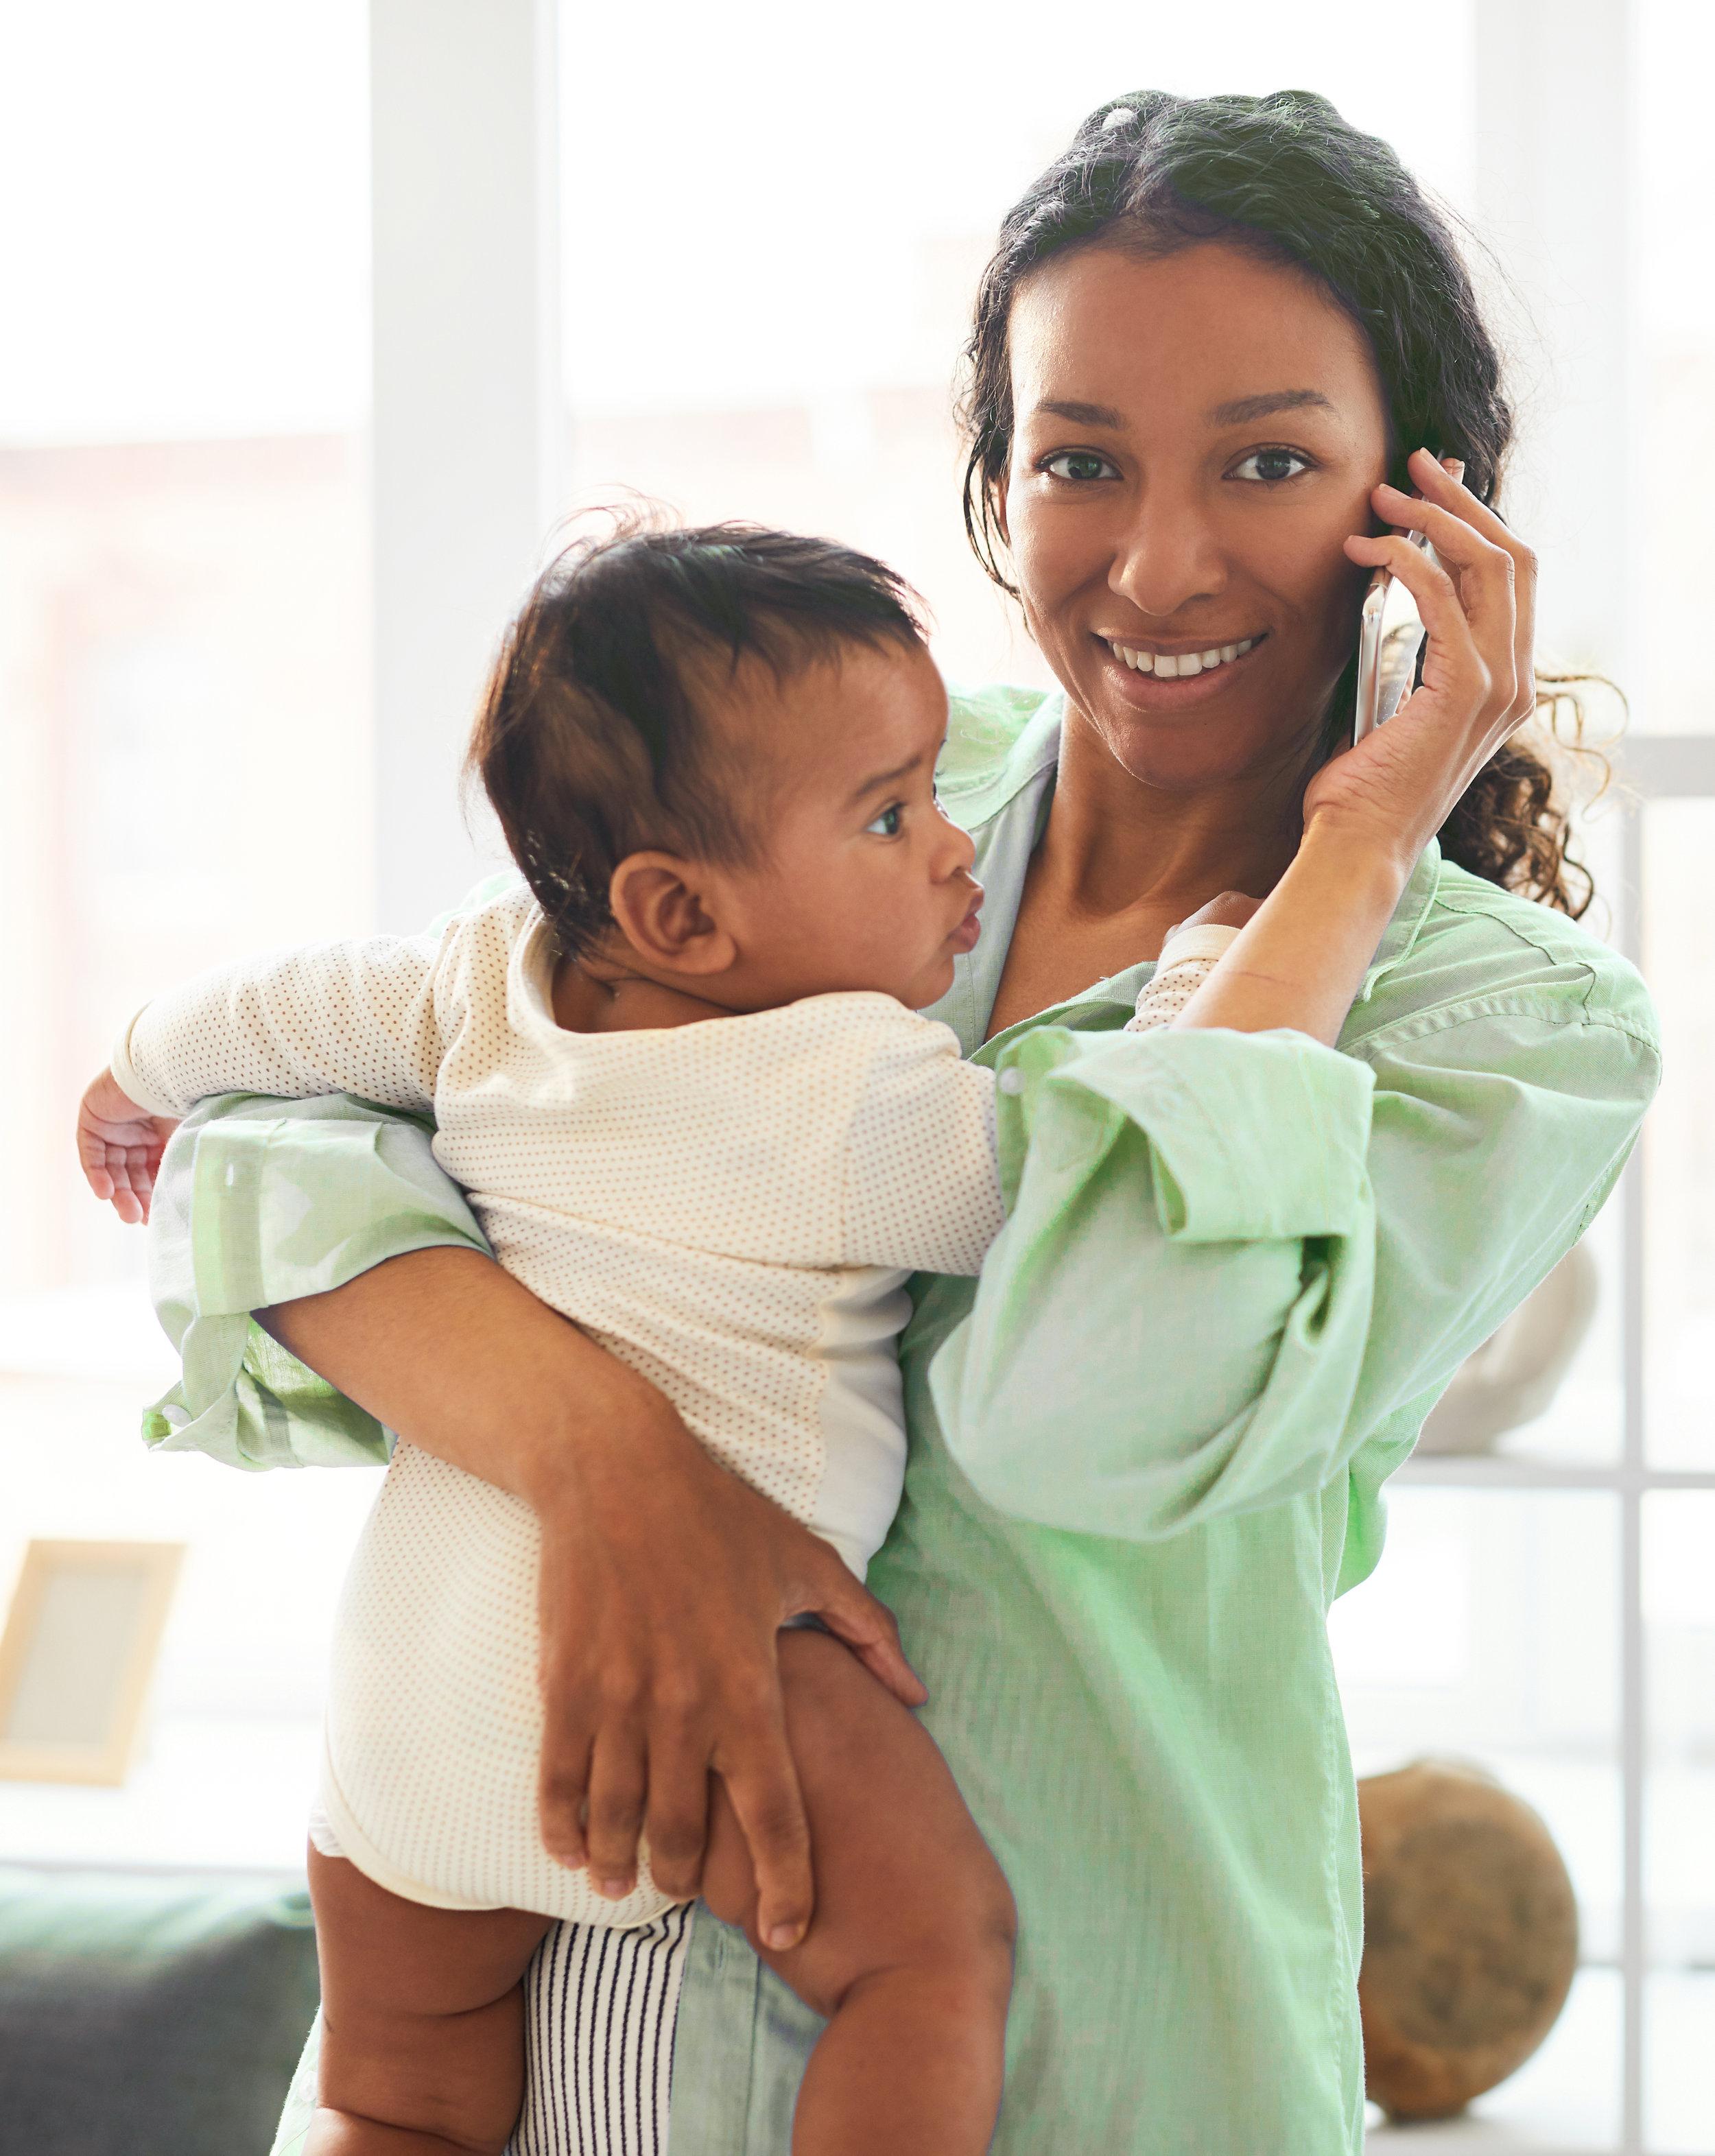 lifestyle-of-modern-young-mom-B7ATURC1.jpg